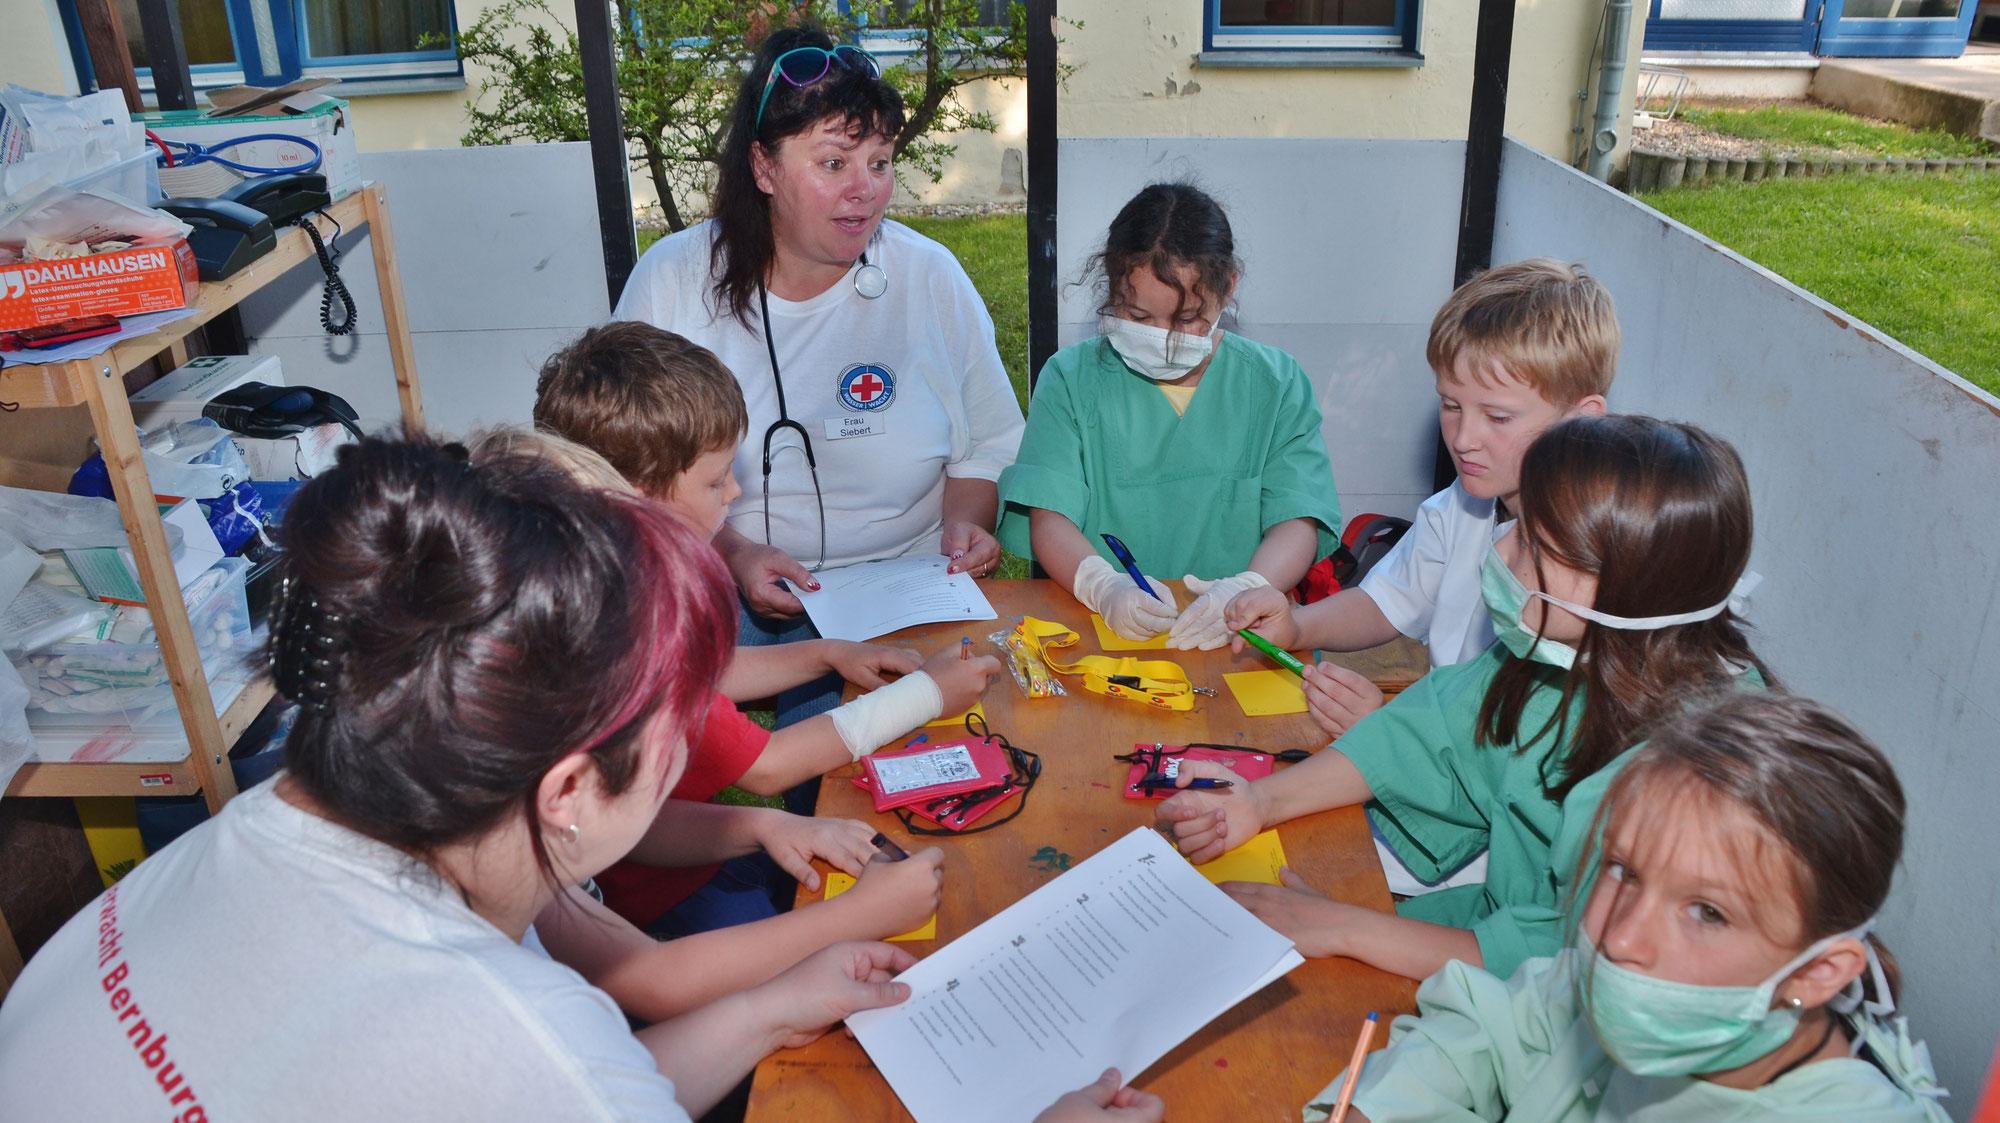 Kinderstadt Bärenhausen eröffnet Ende Juli in Bernburg